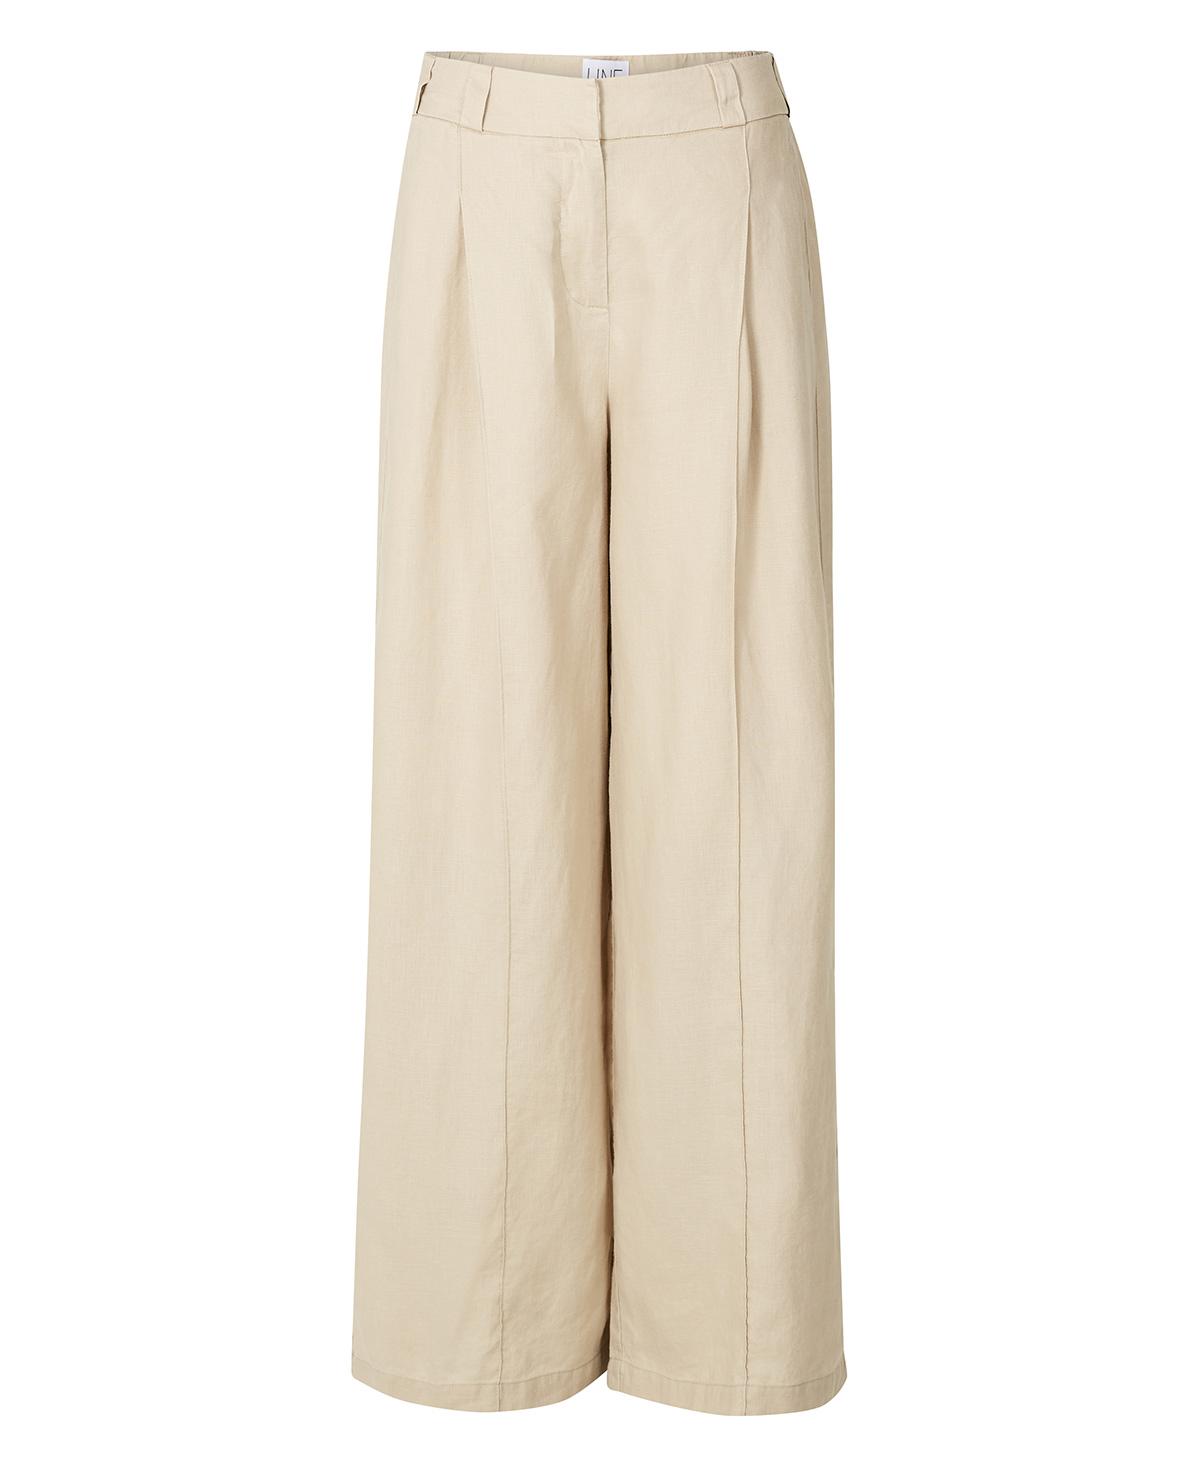 New three trousers